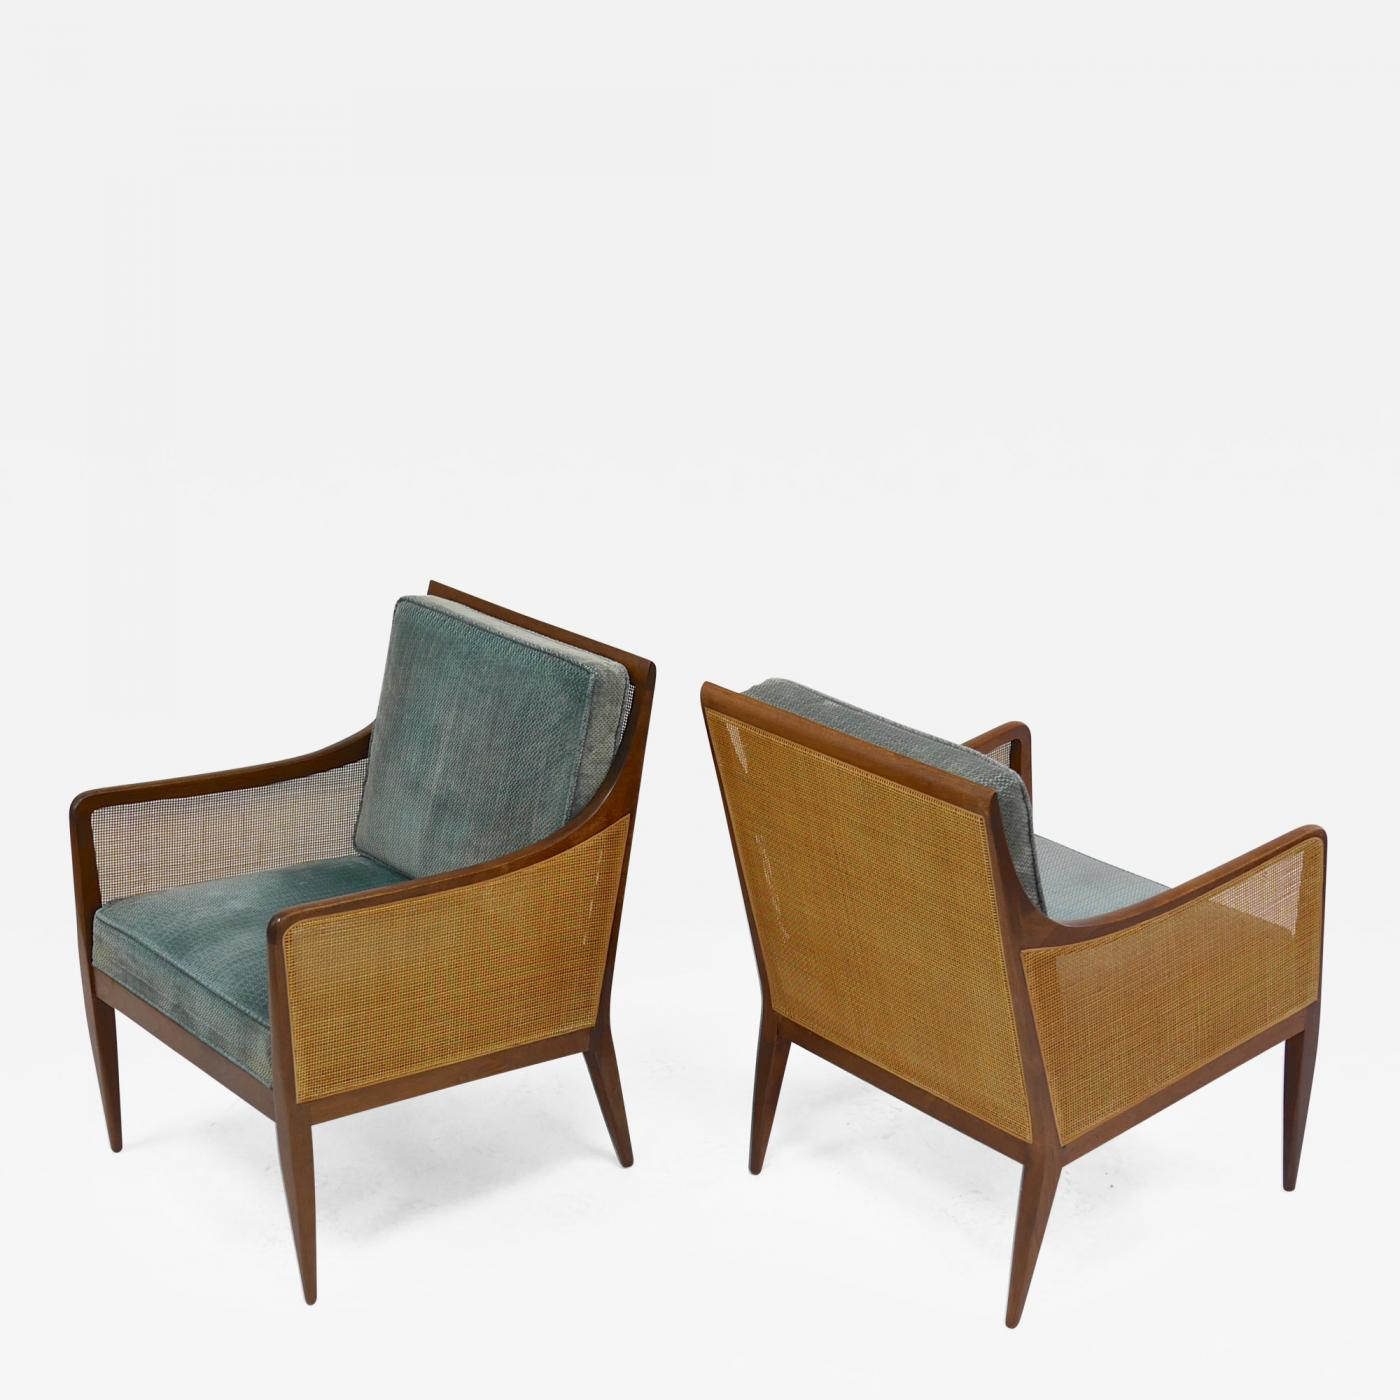 milo baughman furniture. Listings / Furniture Seating Armchairs · Milo Baughman I